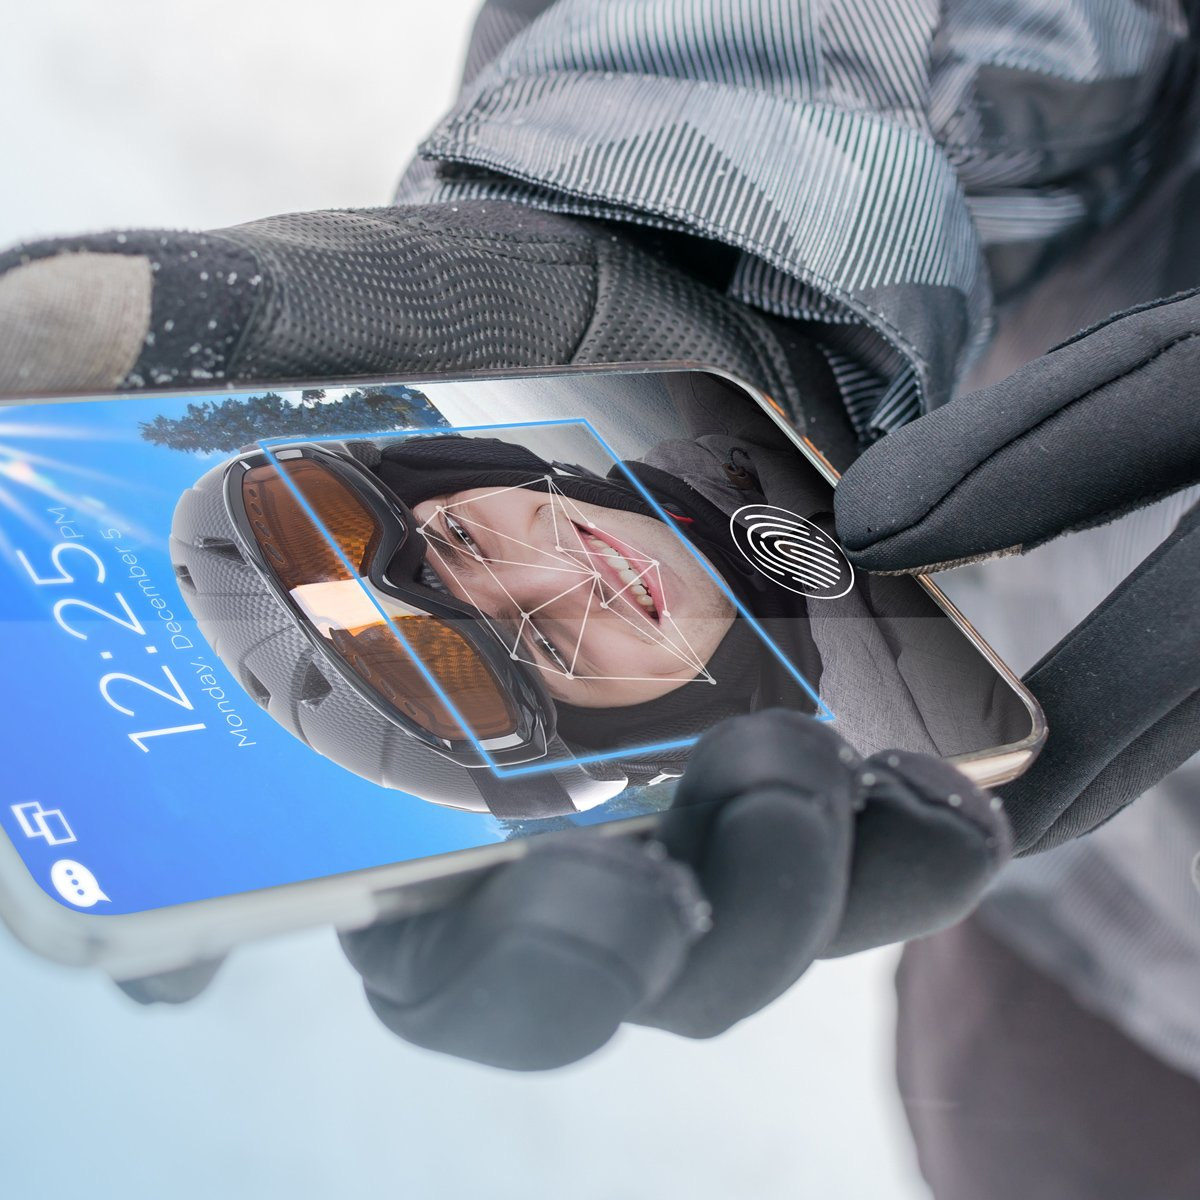 Synaptics fingerprint facial recognition